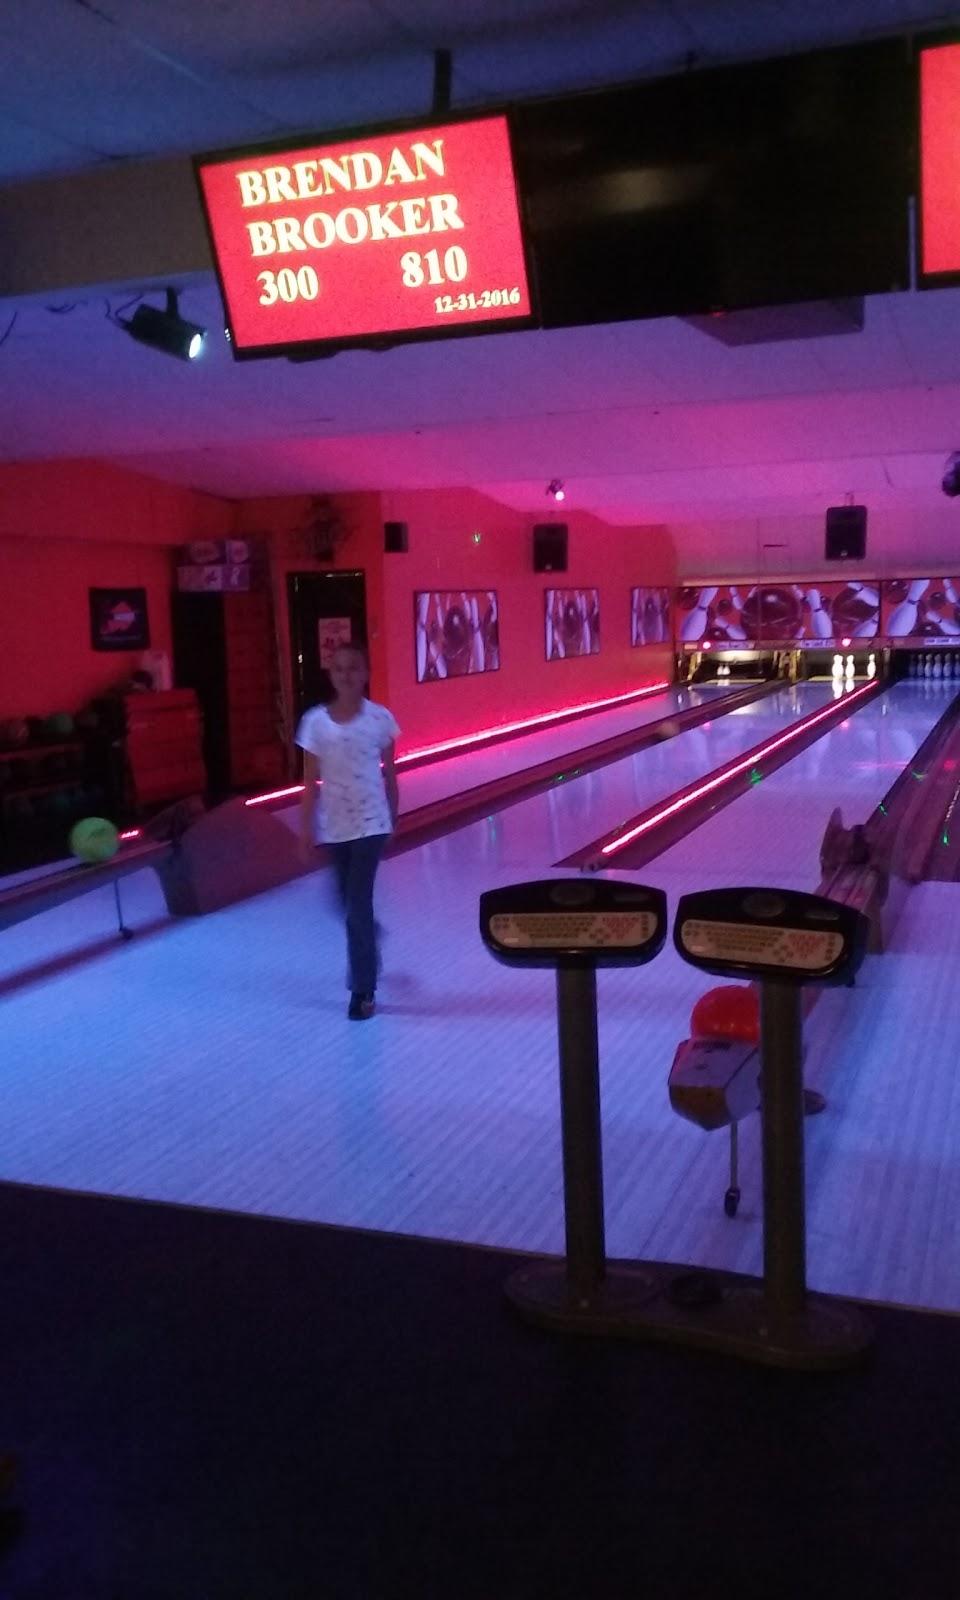 Lake Street Lanes - bowling alley  | Photo 10 of 10 | Address: 10 Lake St, New Berlin, NY 13411, USA | Phone: (607) 847-8594